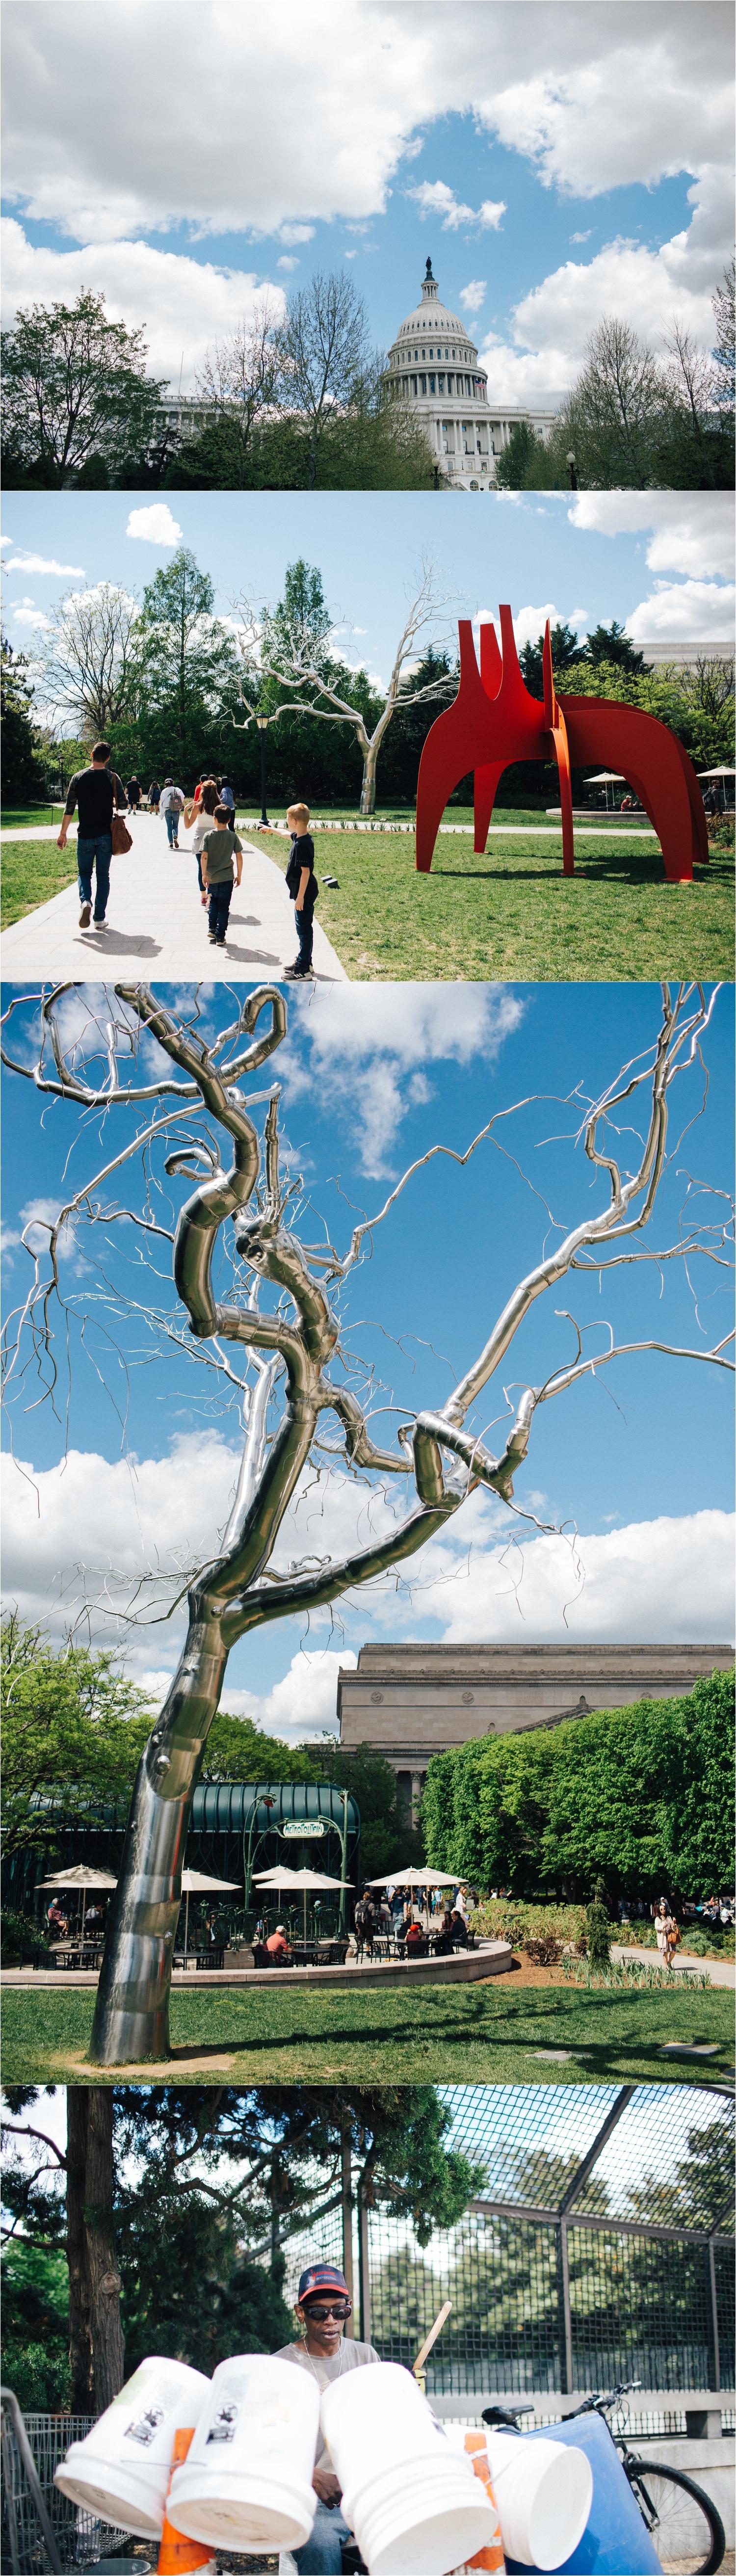 allisoncorrin_2007.jpg